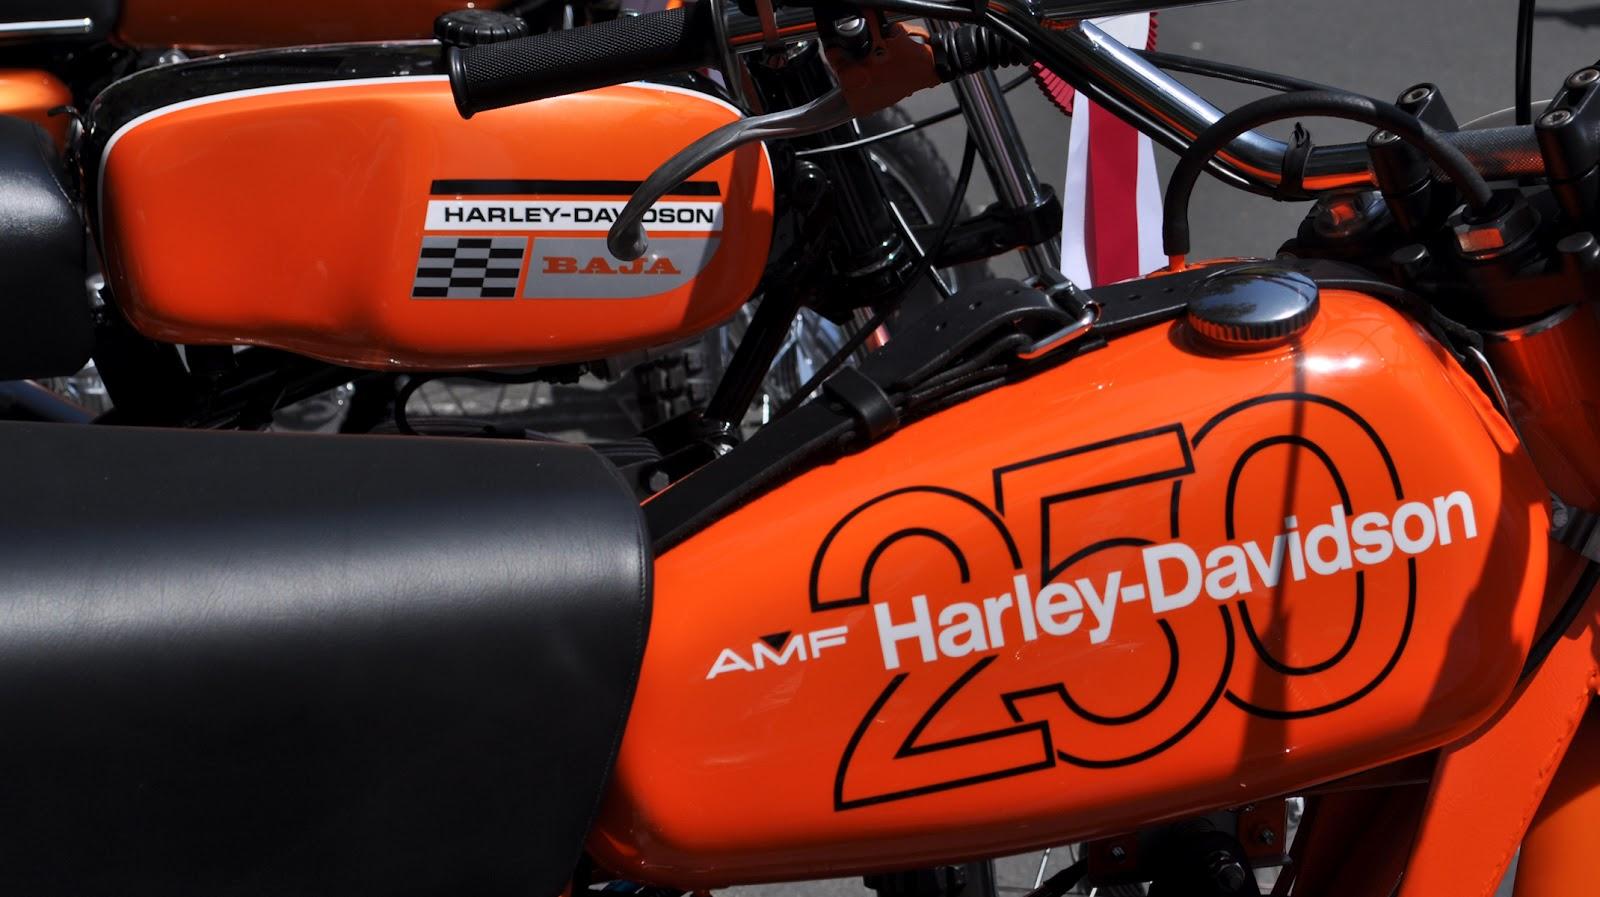 Harley Baja 100